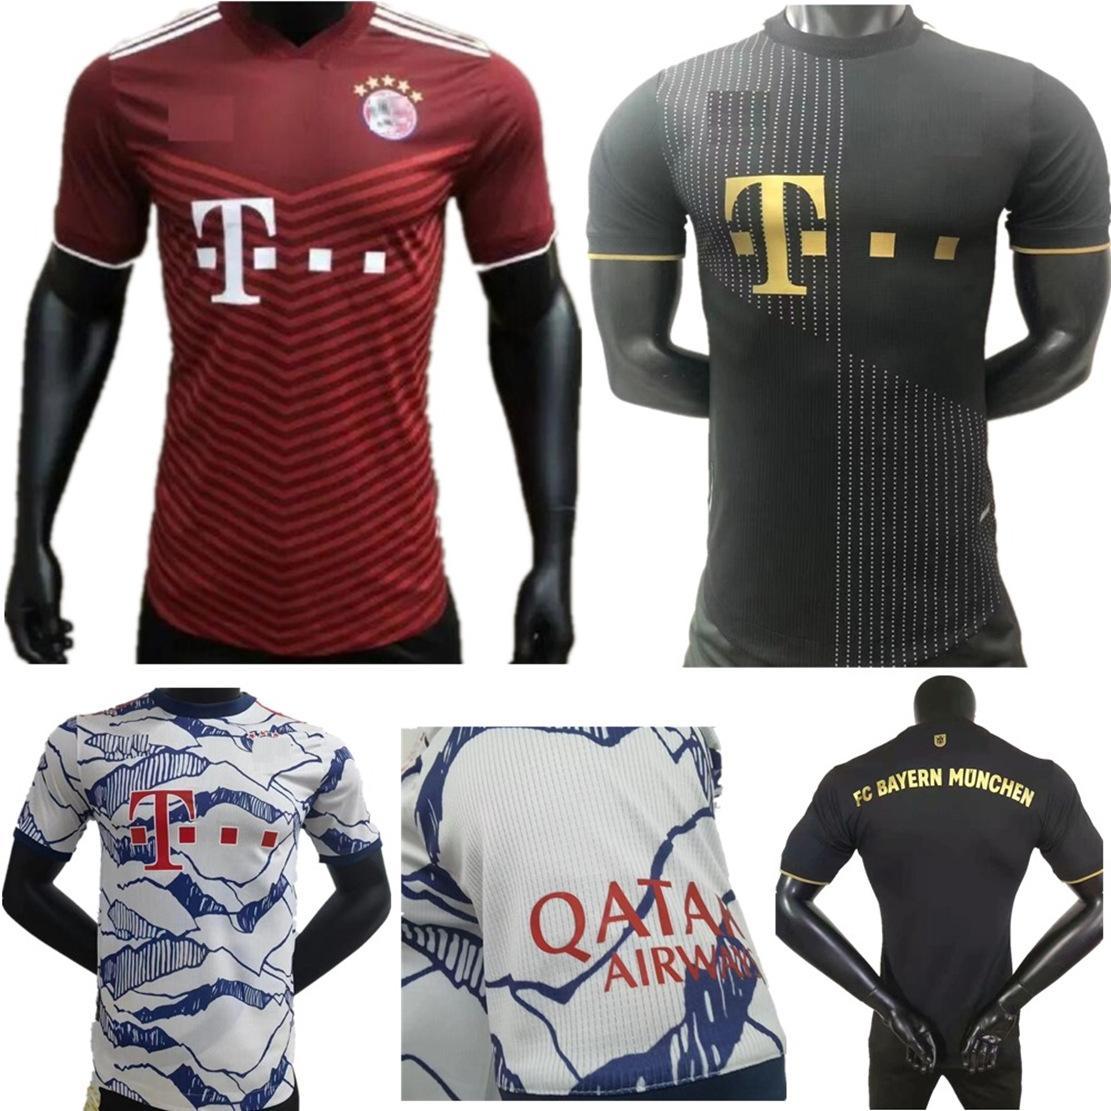 2021 Bayern 성인 남성 선수 버전 축구 유니폼 뮌헨 ribery hummels jerseys 2022 Vidal Lewandowski Muller Sane 21 22 홈 멀리 3 축구 유니폼